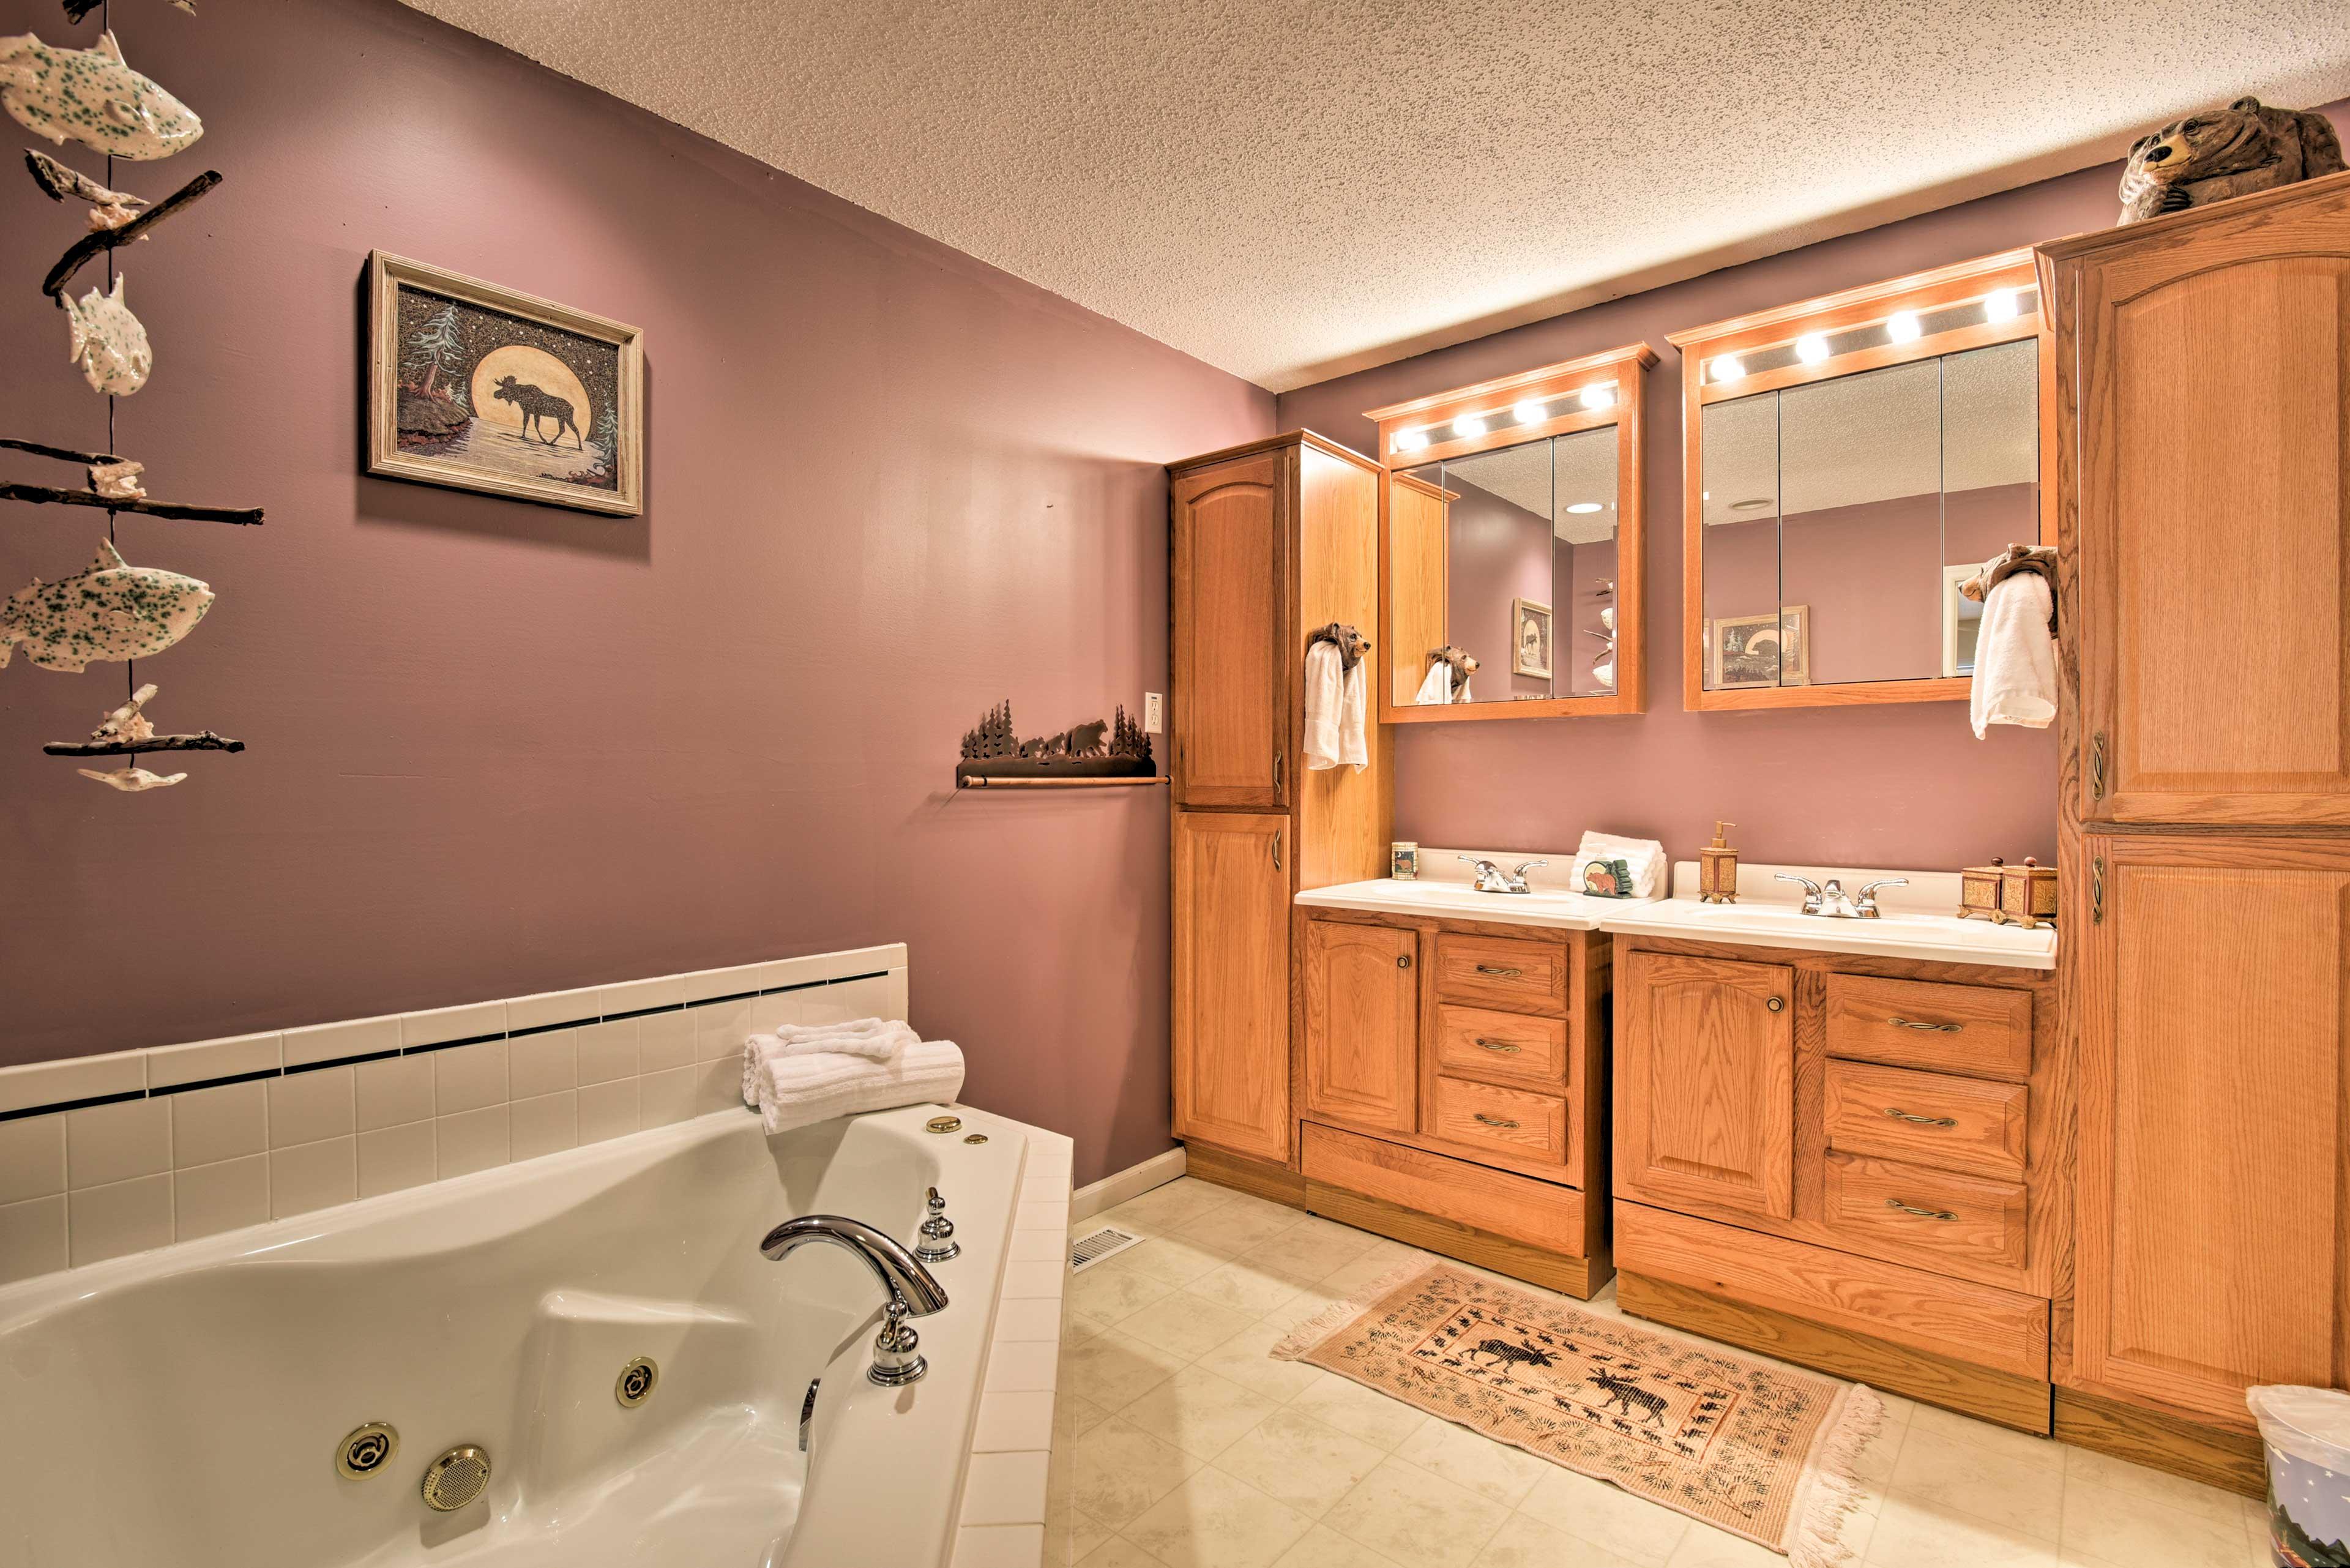 Take a relaxing soak in the tub.